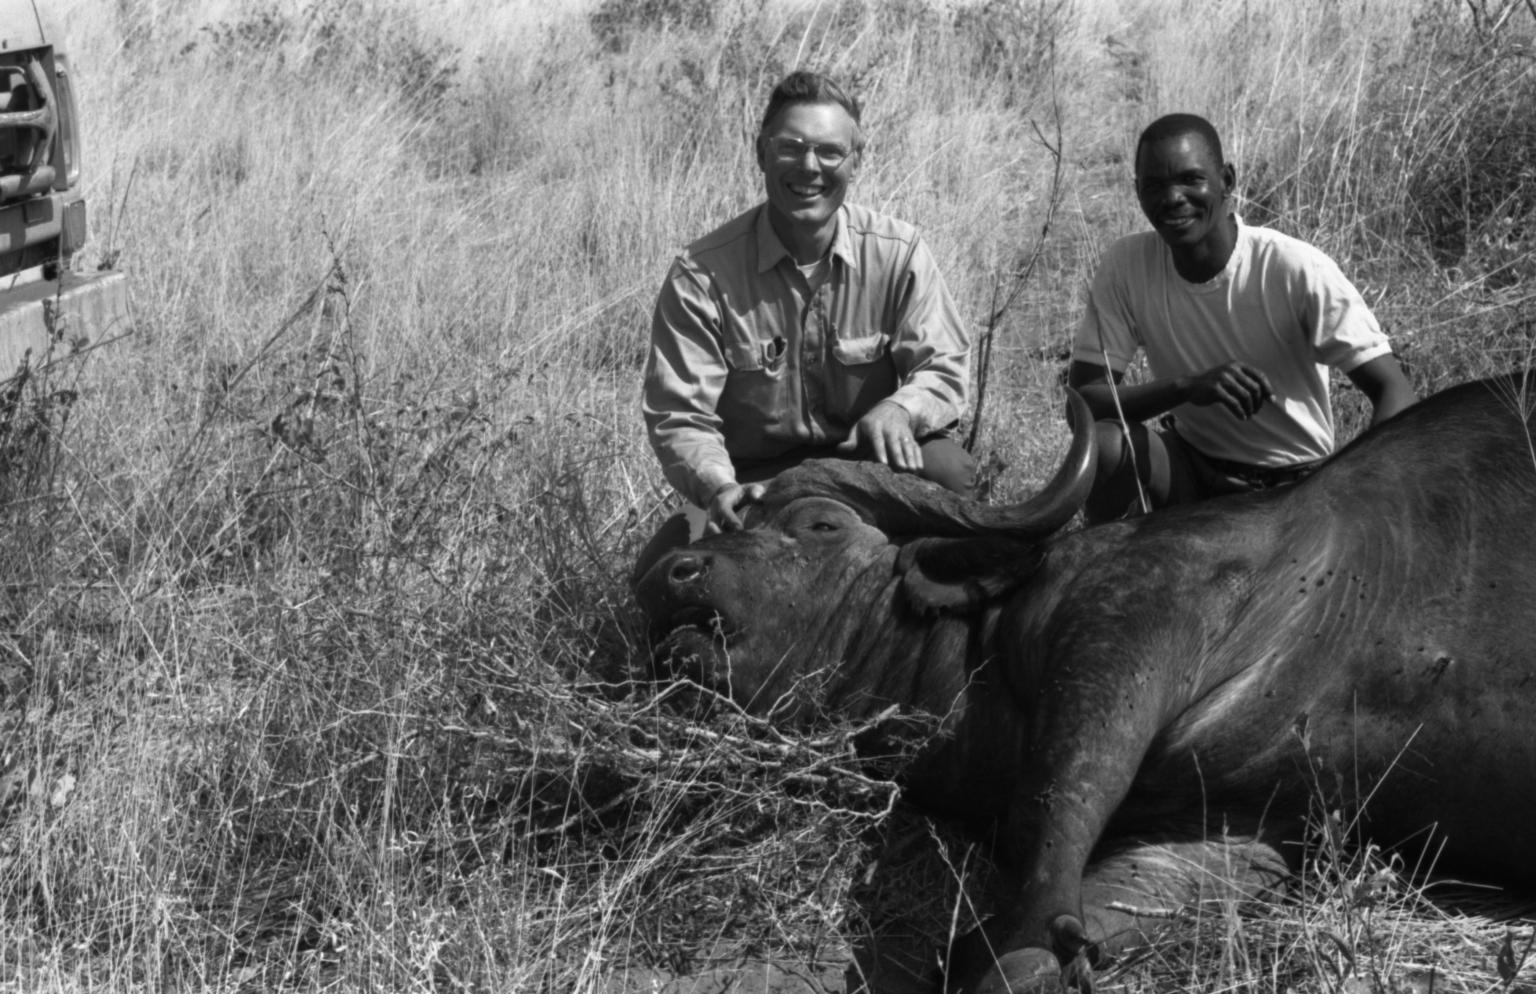 Jack Putnam with Water Buffalo